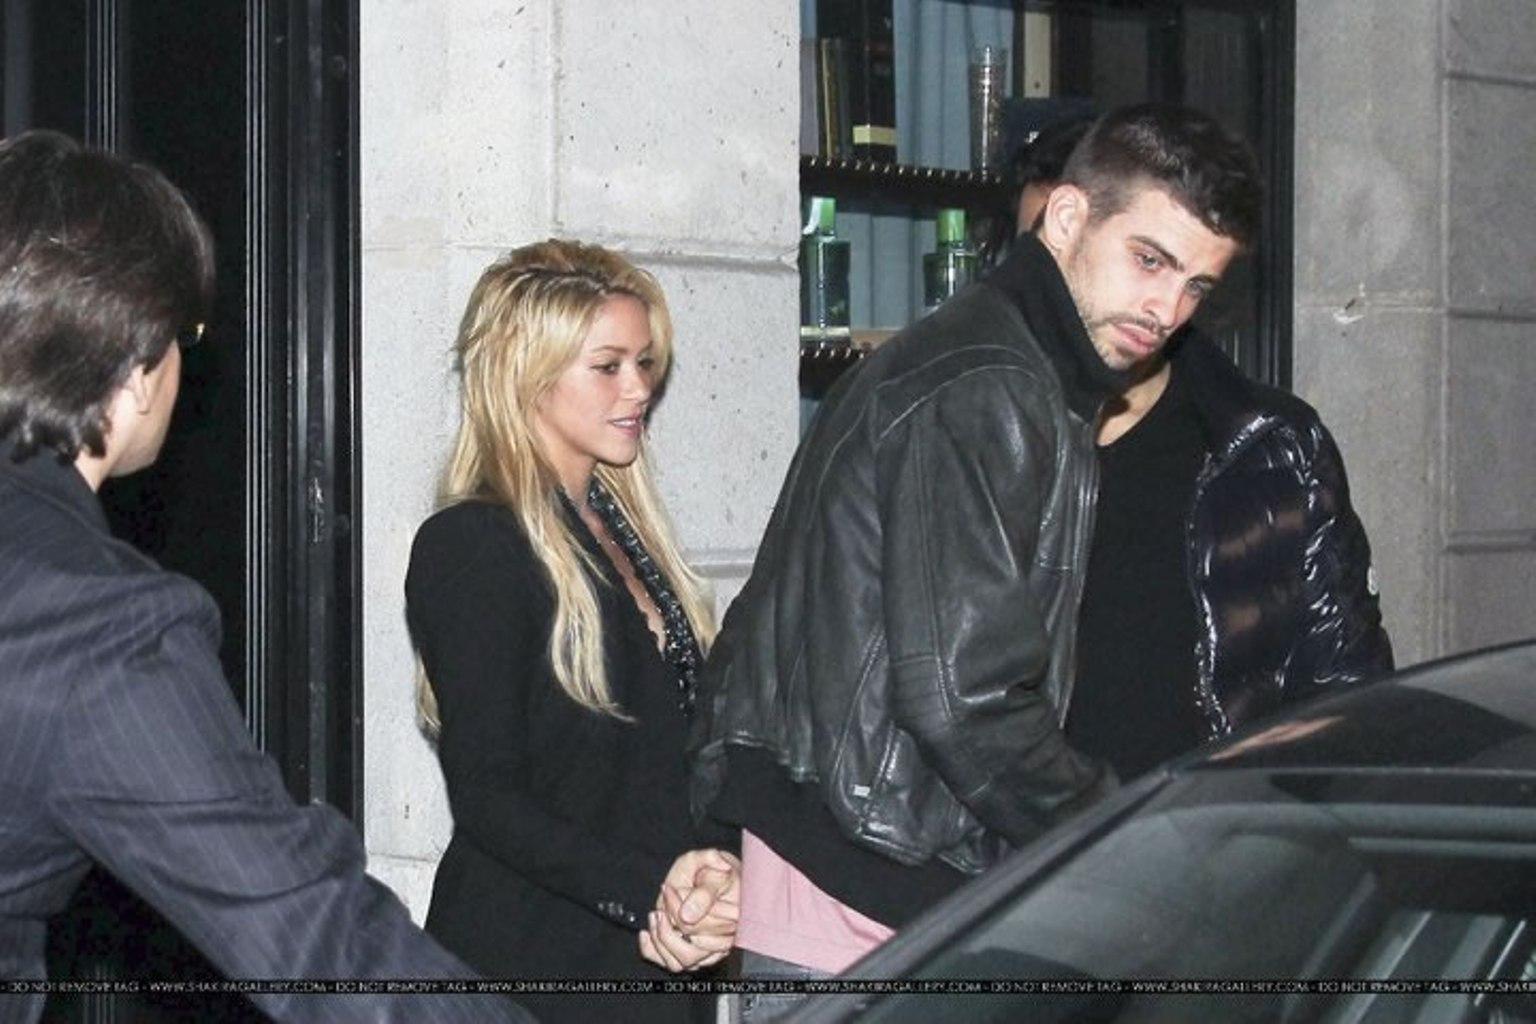 Shakira and Pique. - Page 2 Gerard-Piqu-Shakira-and-brother-gerard-pique-19520952-1536-1024